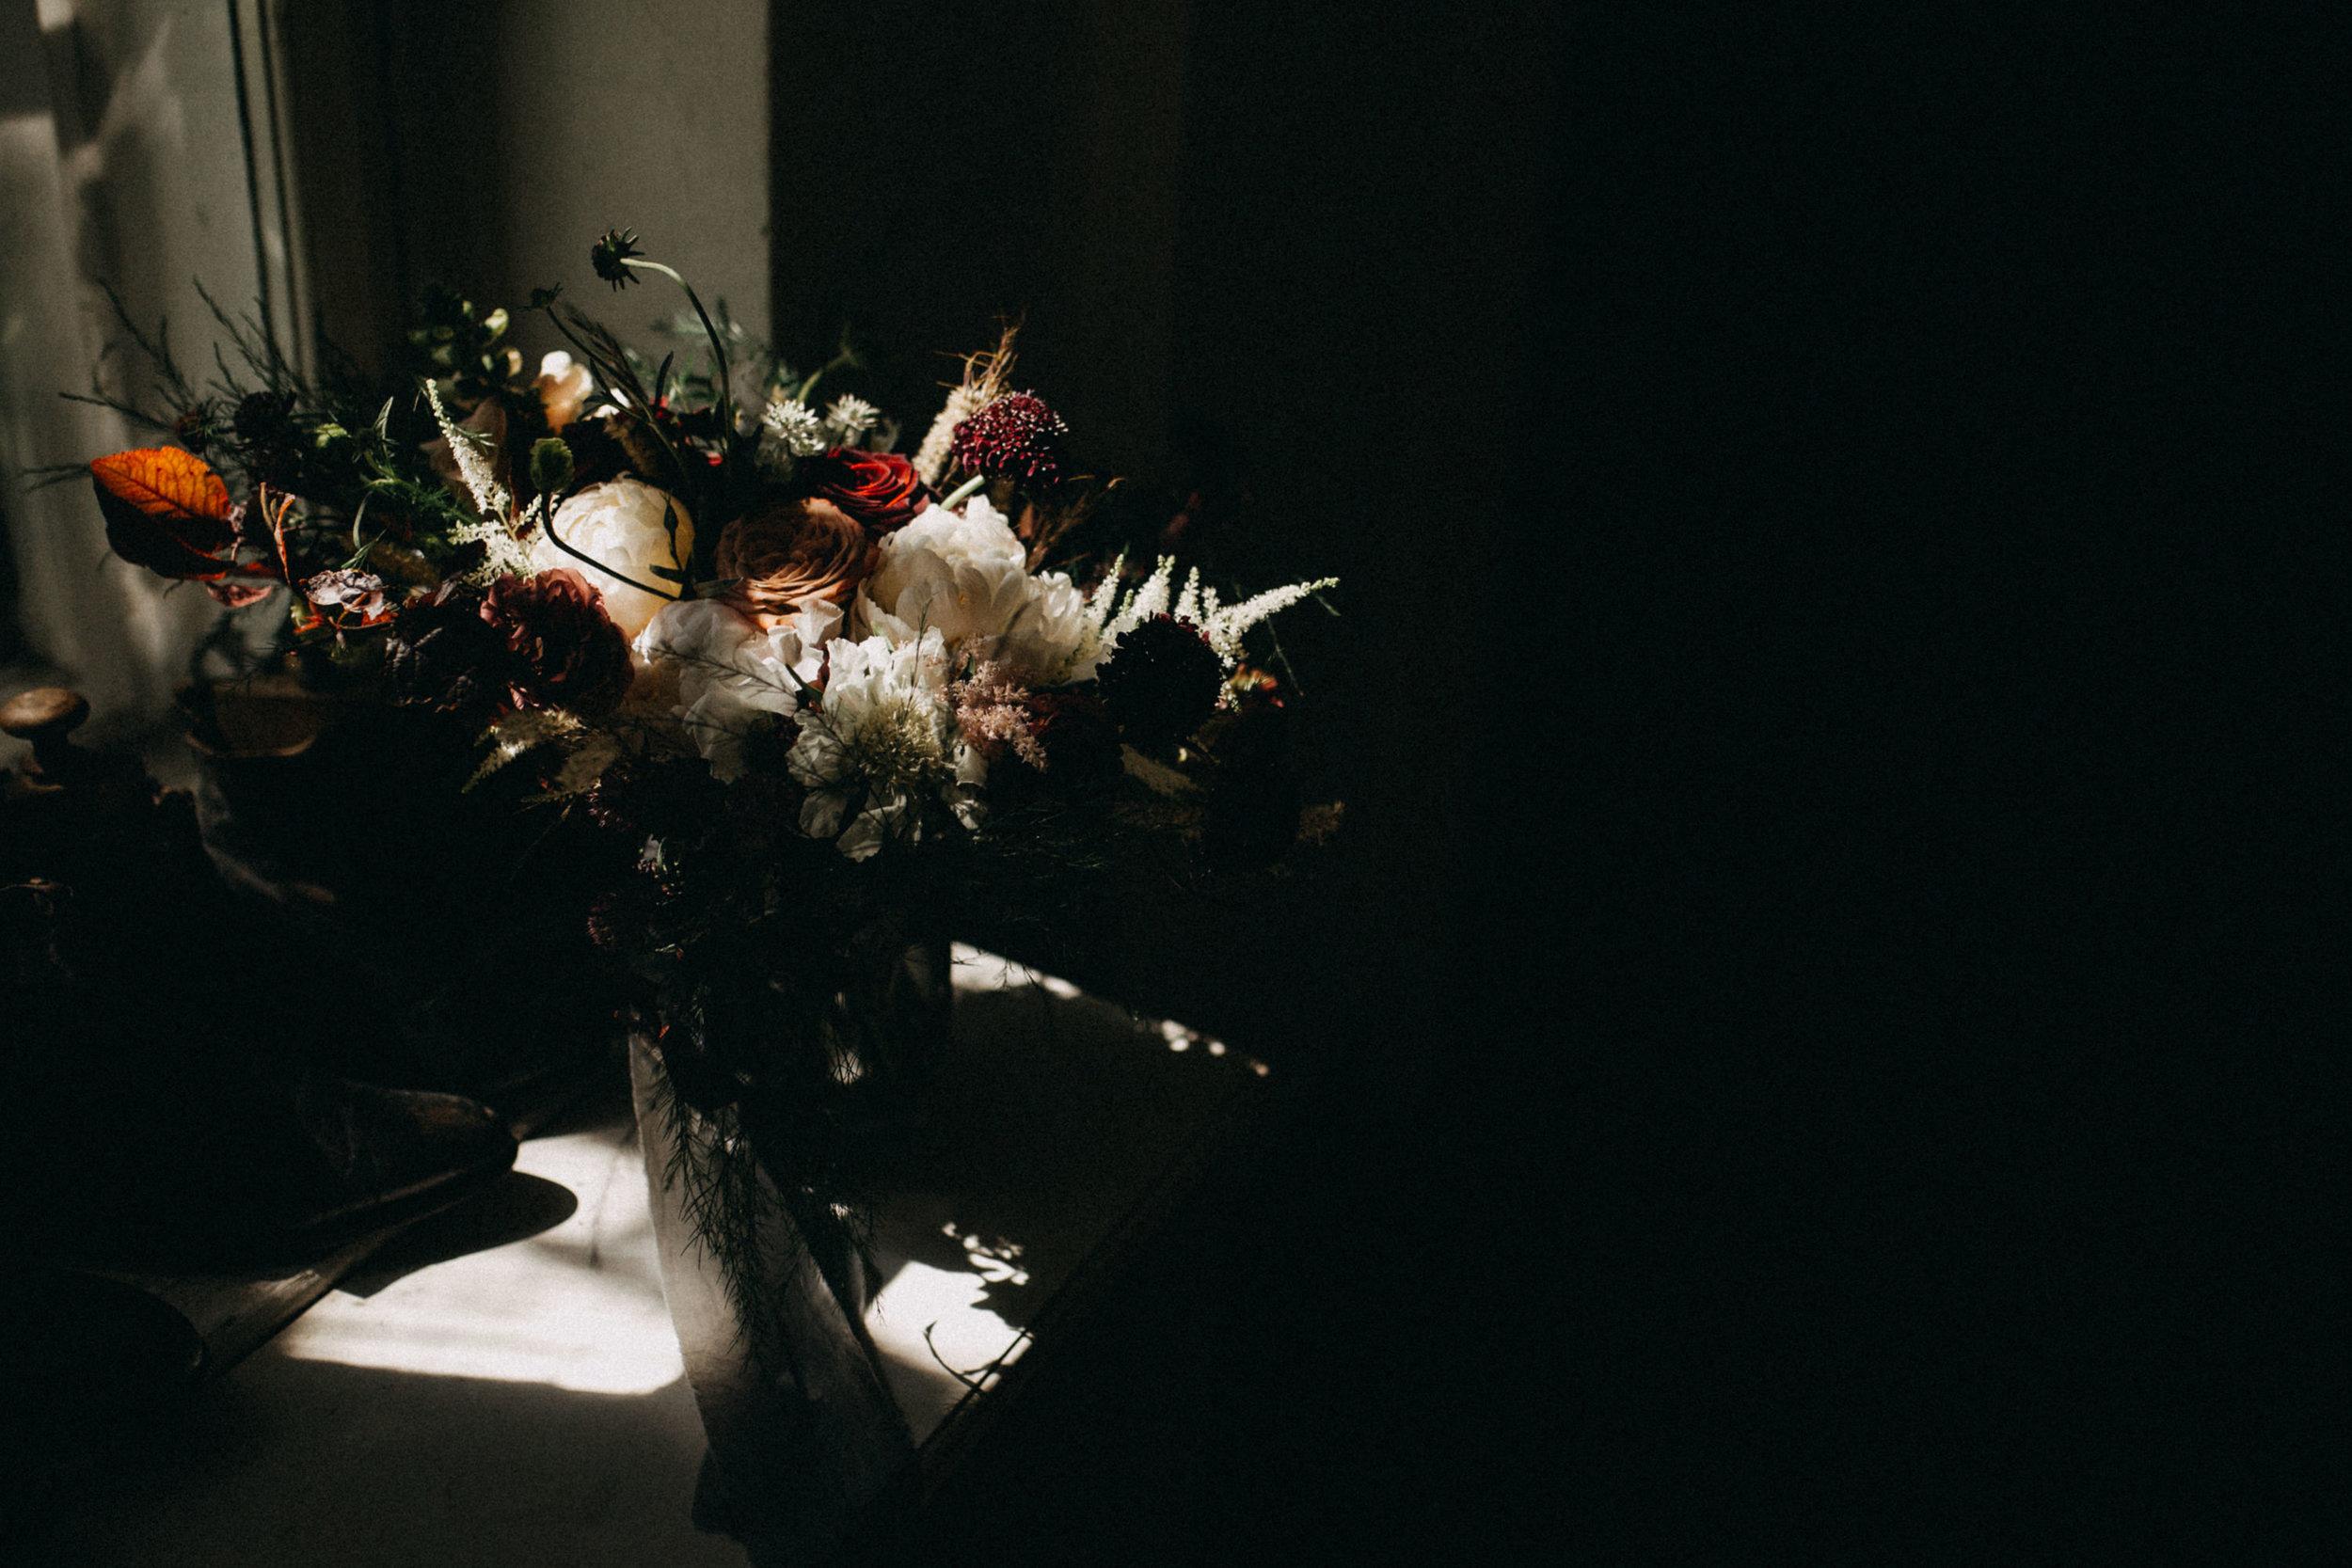 hungary-wedding-9.jpg